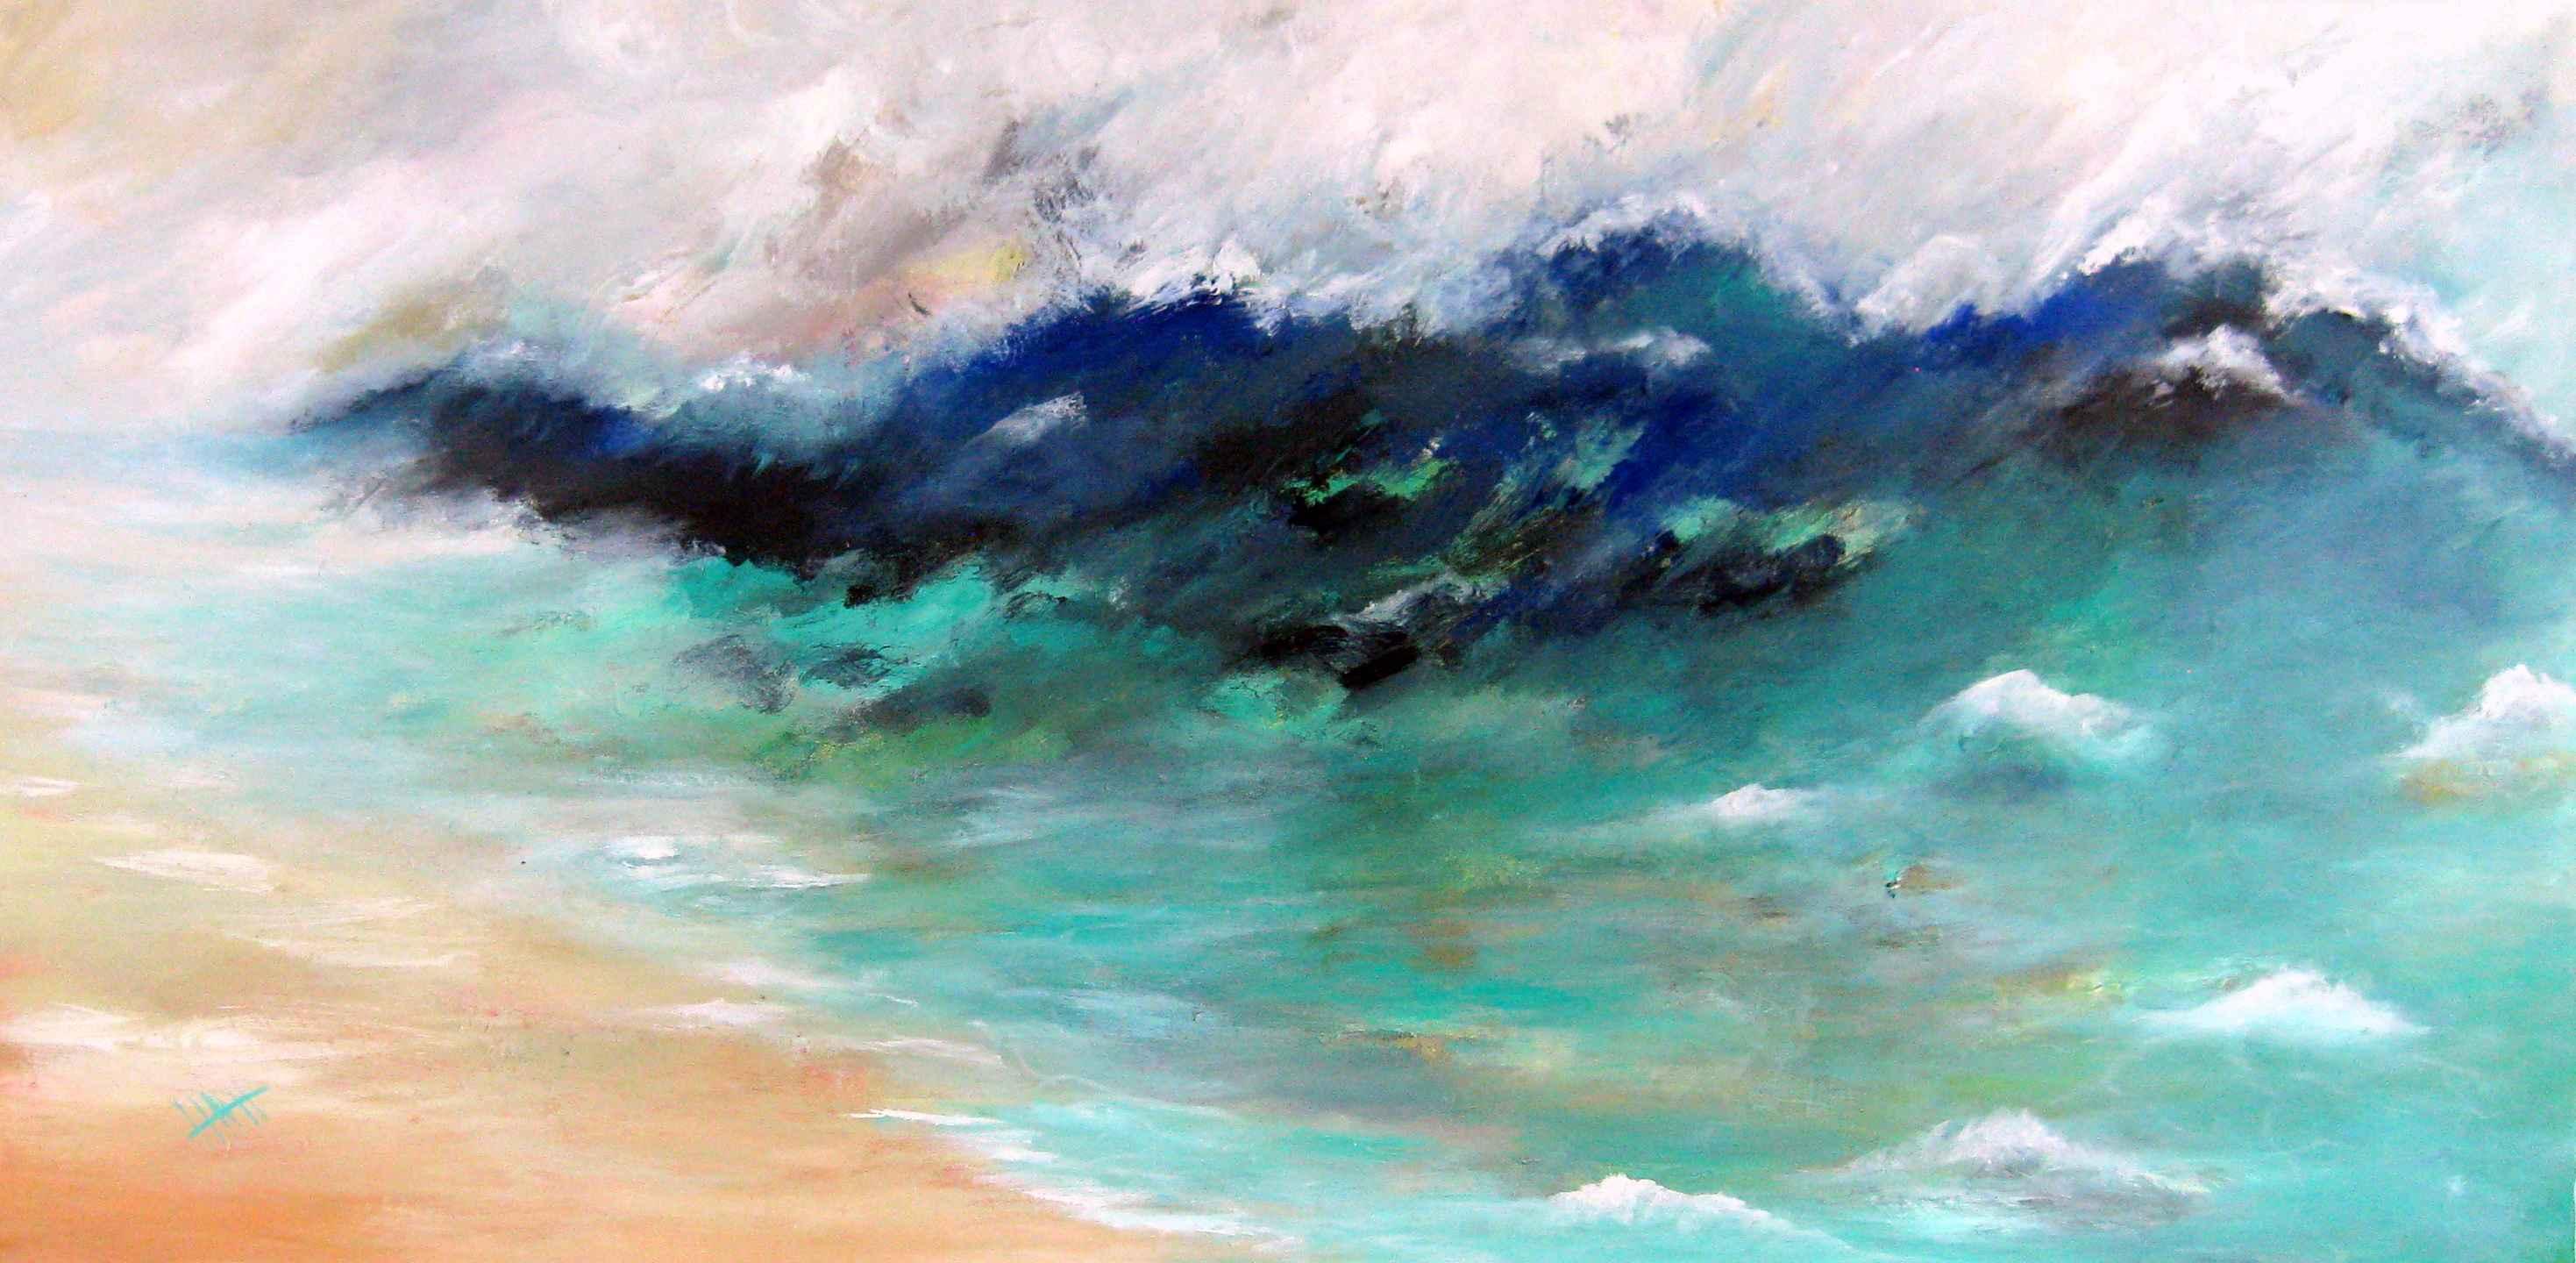 602 Stormy Seas Abstr... by Mr Nicholas Hadeed - Masterpiece Online